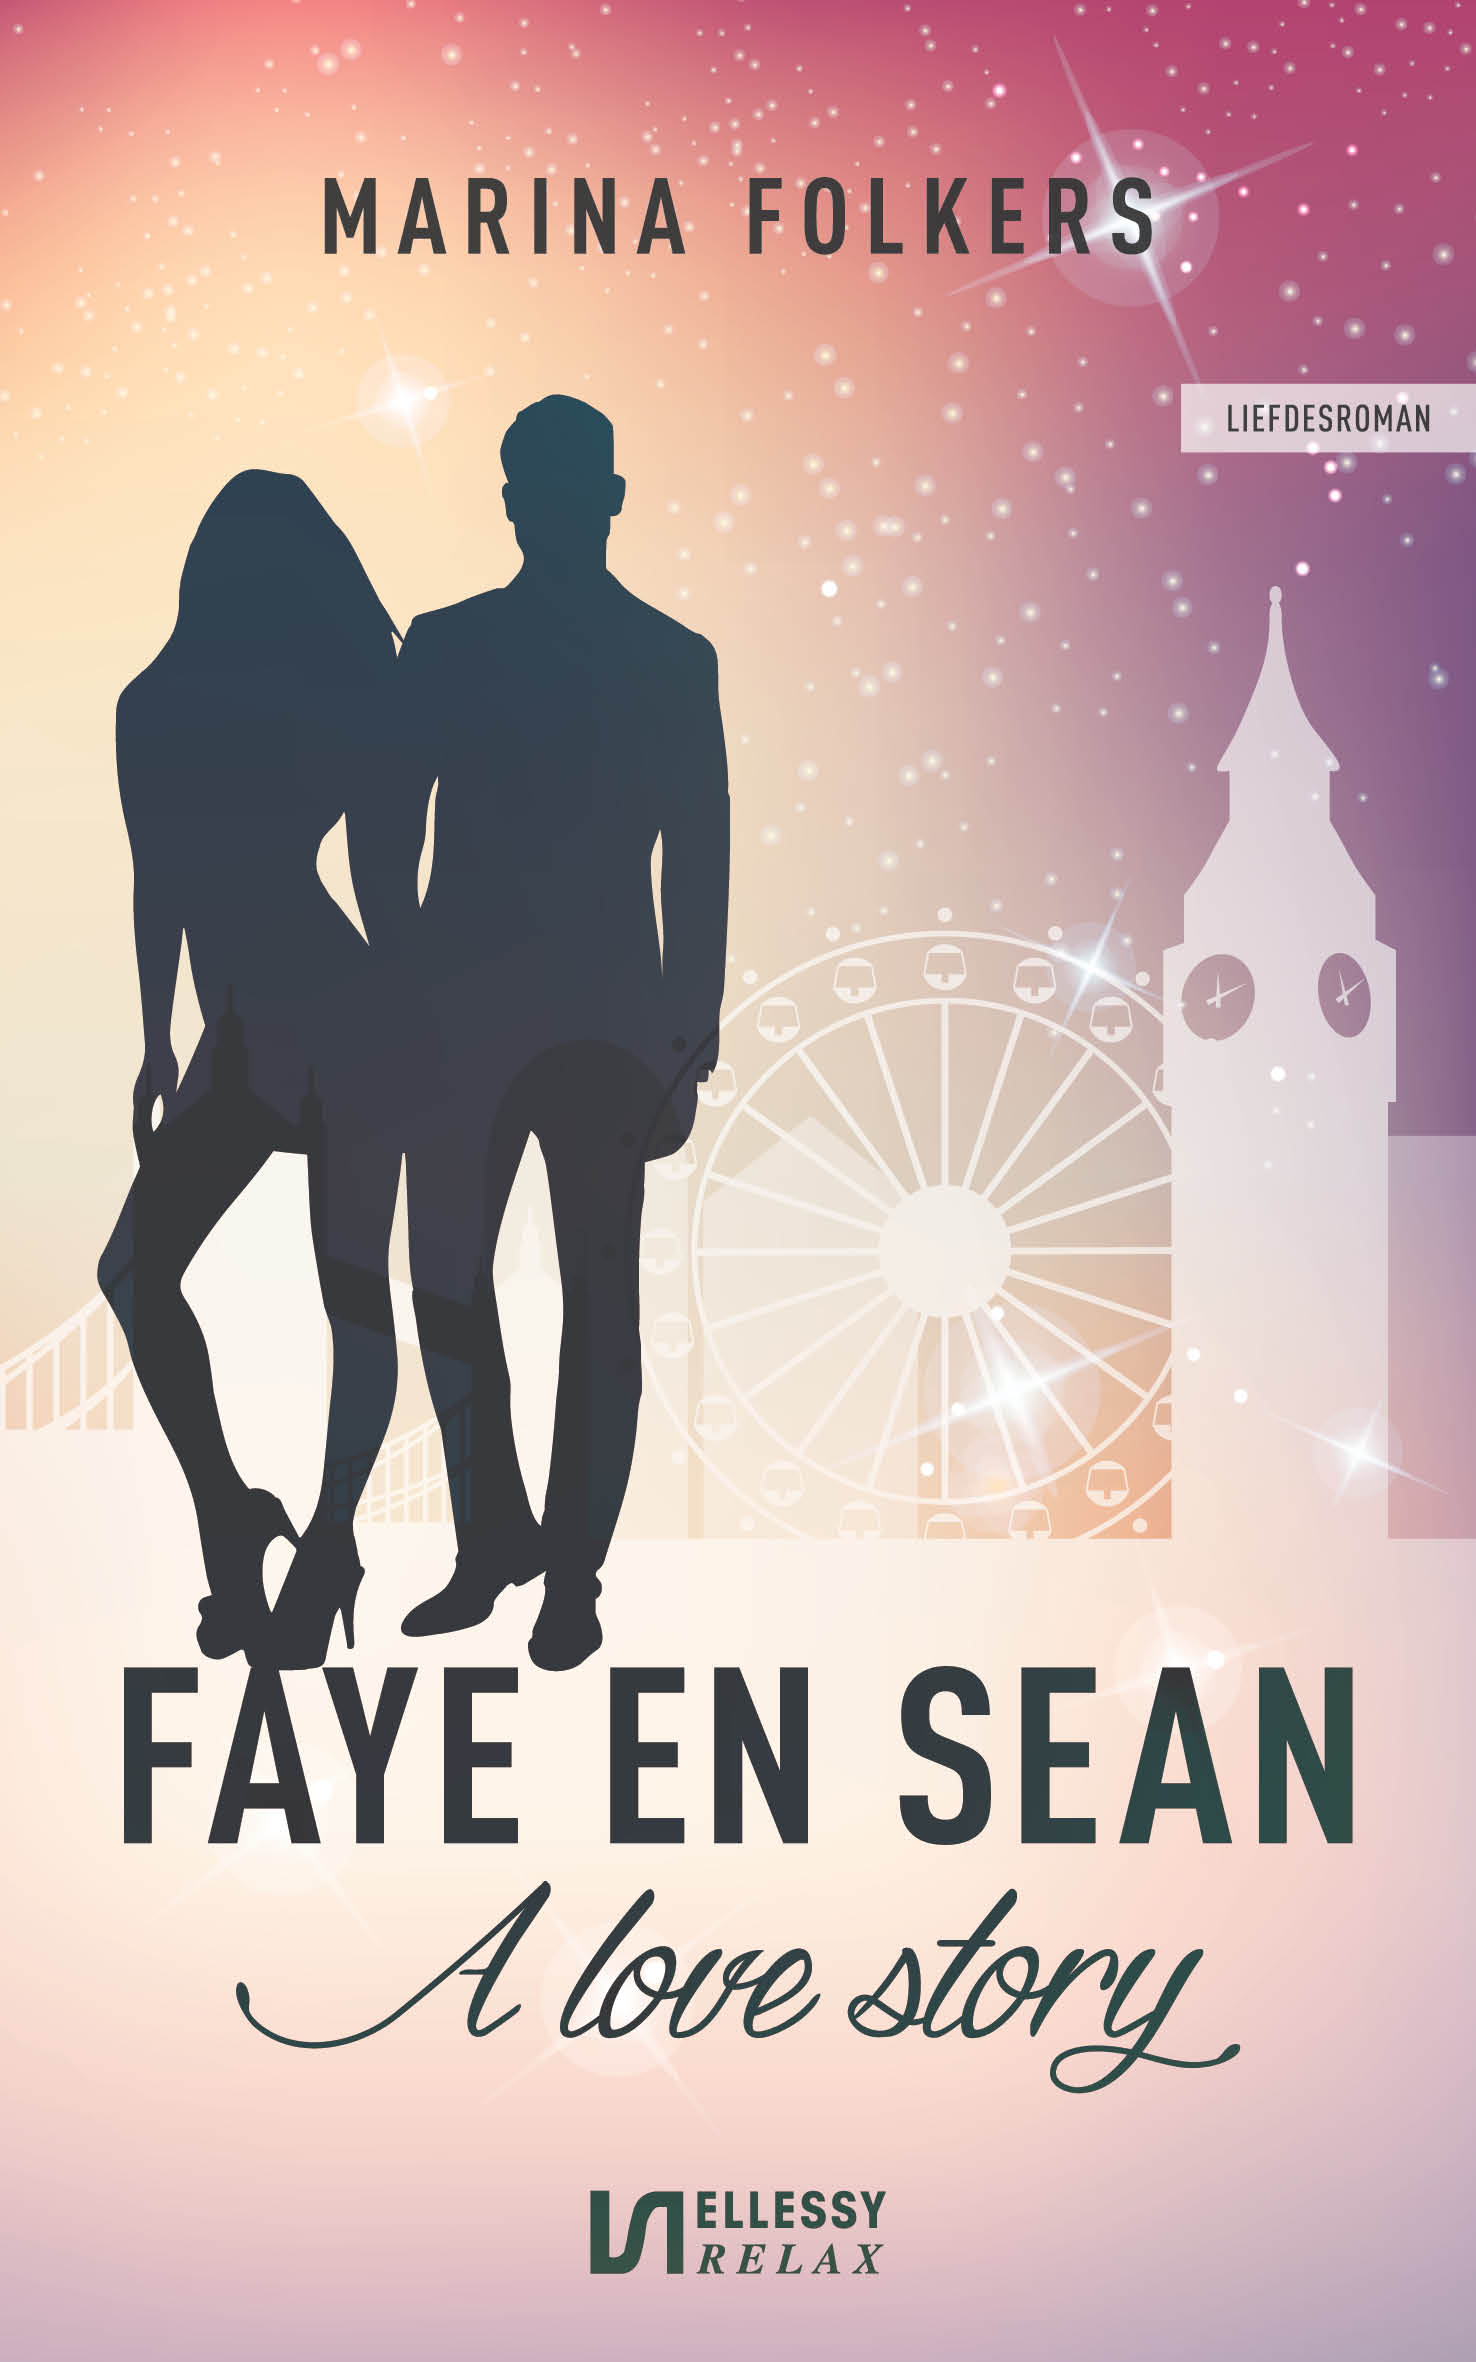 Faye en Sean, a love story